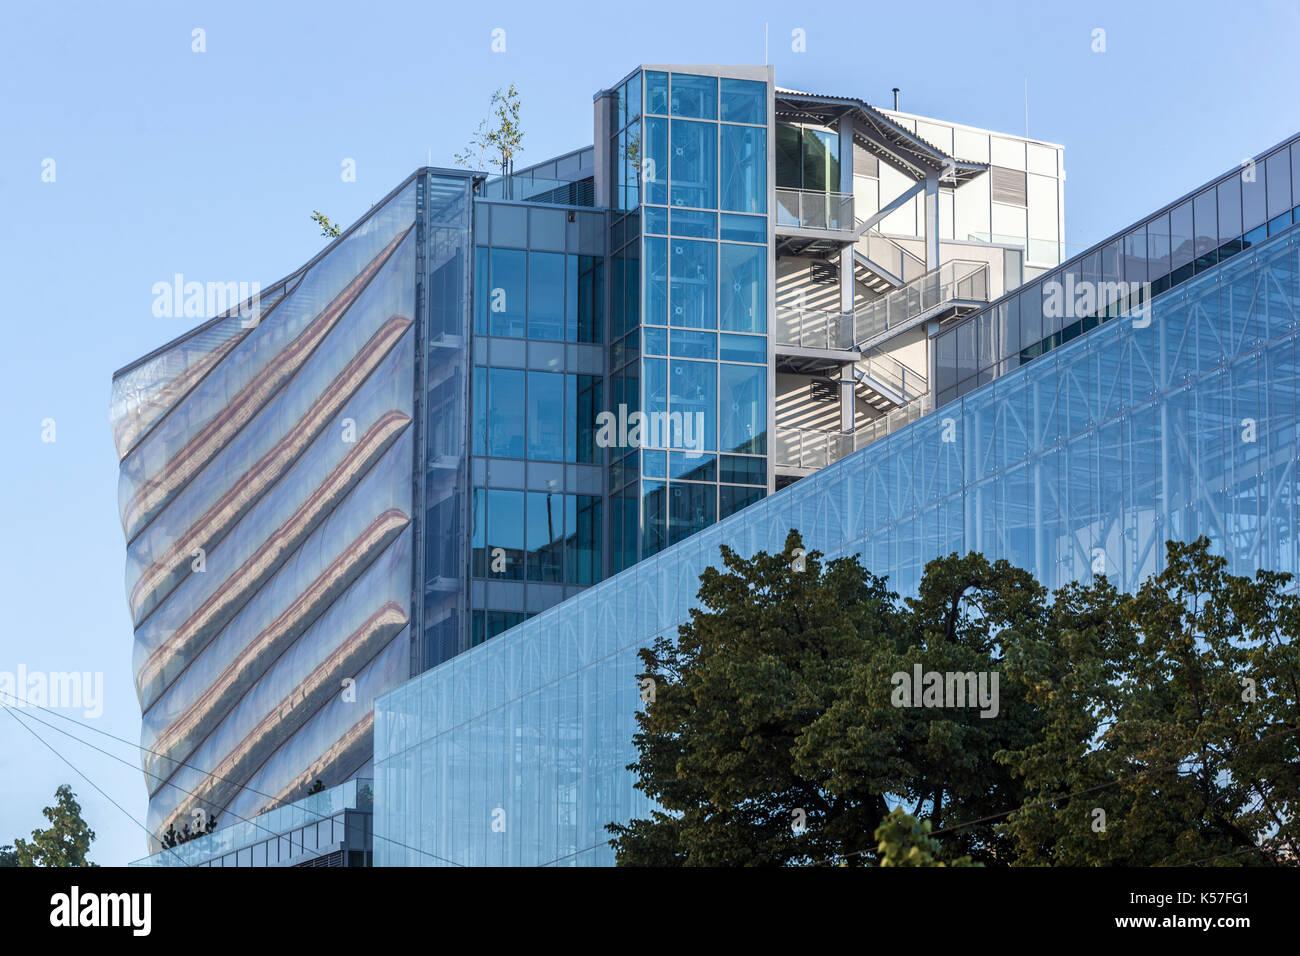 Modern Architecture Of The Czech Institute Of Informatics Robotics